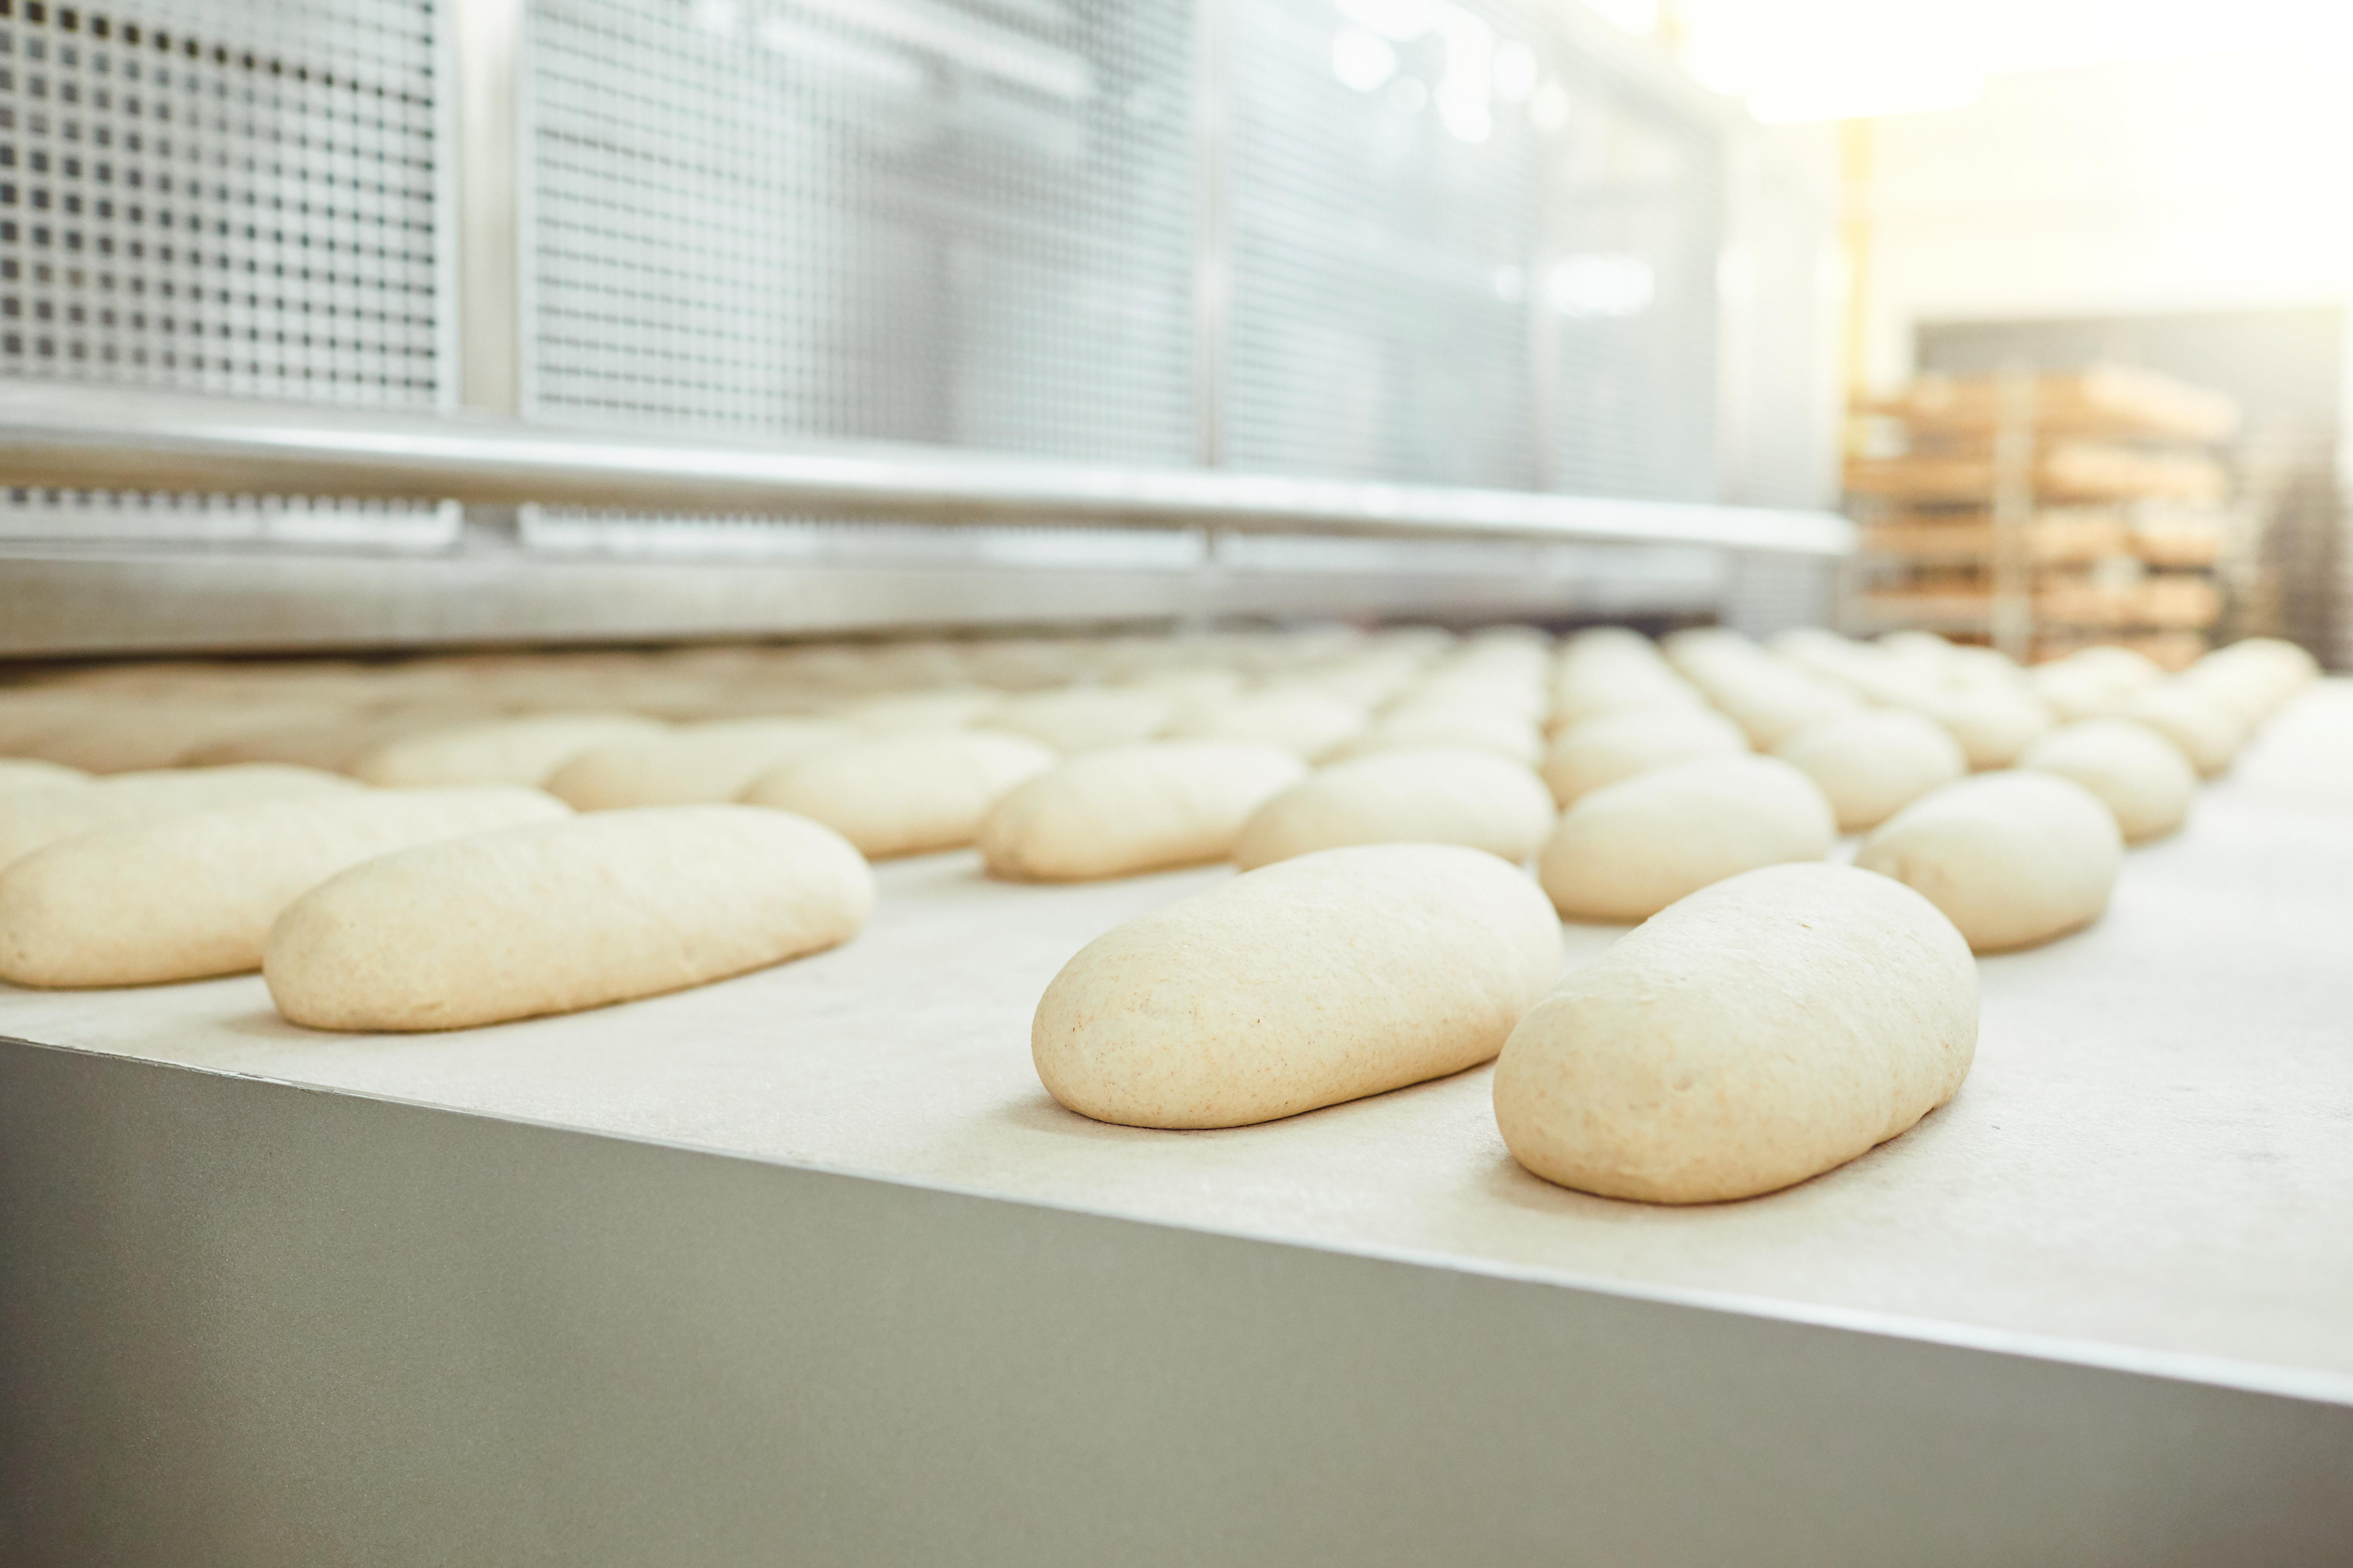 Bakery Census